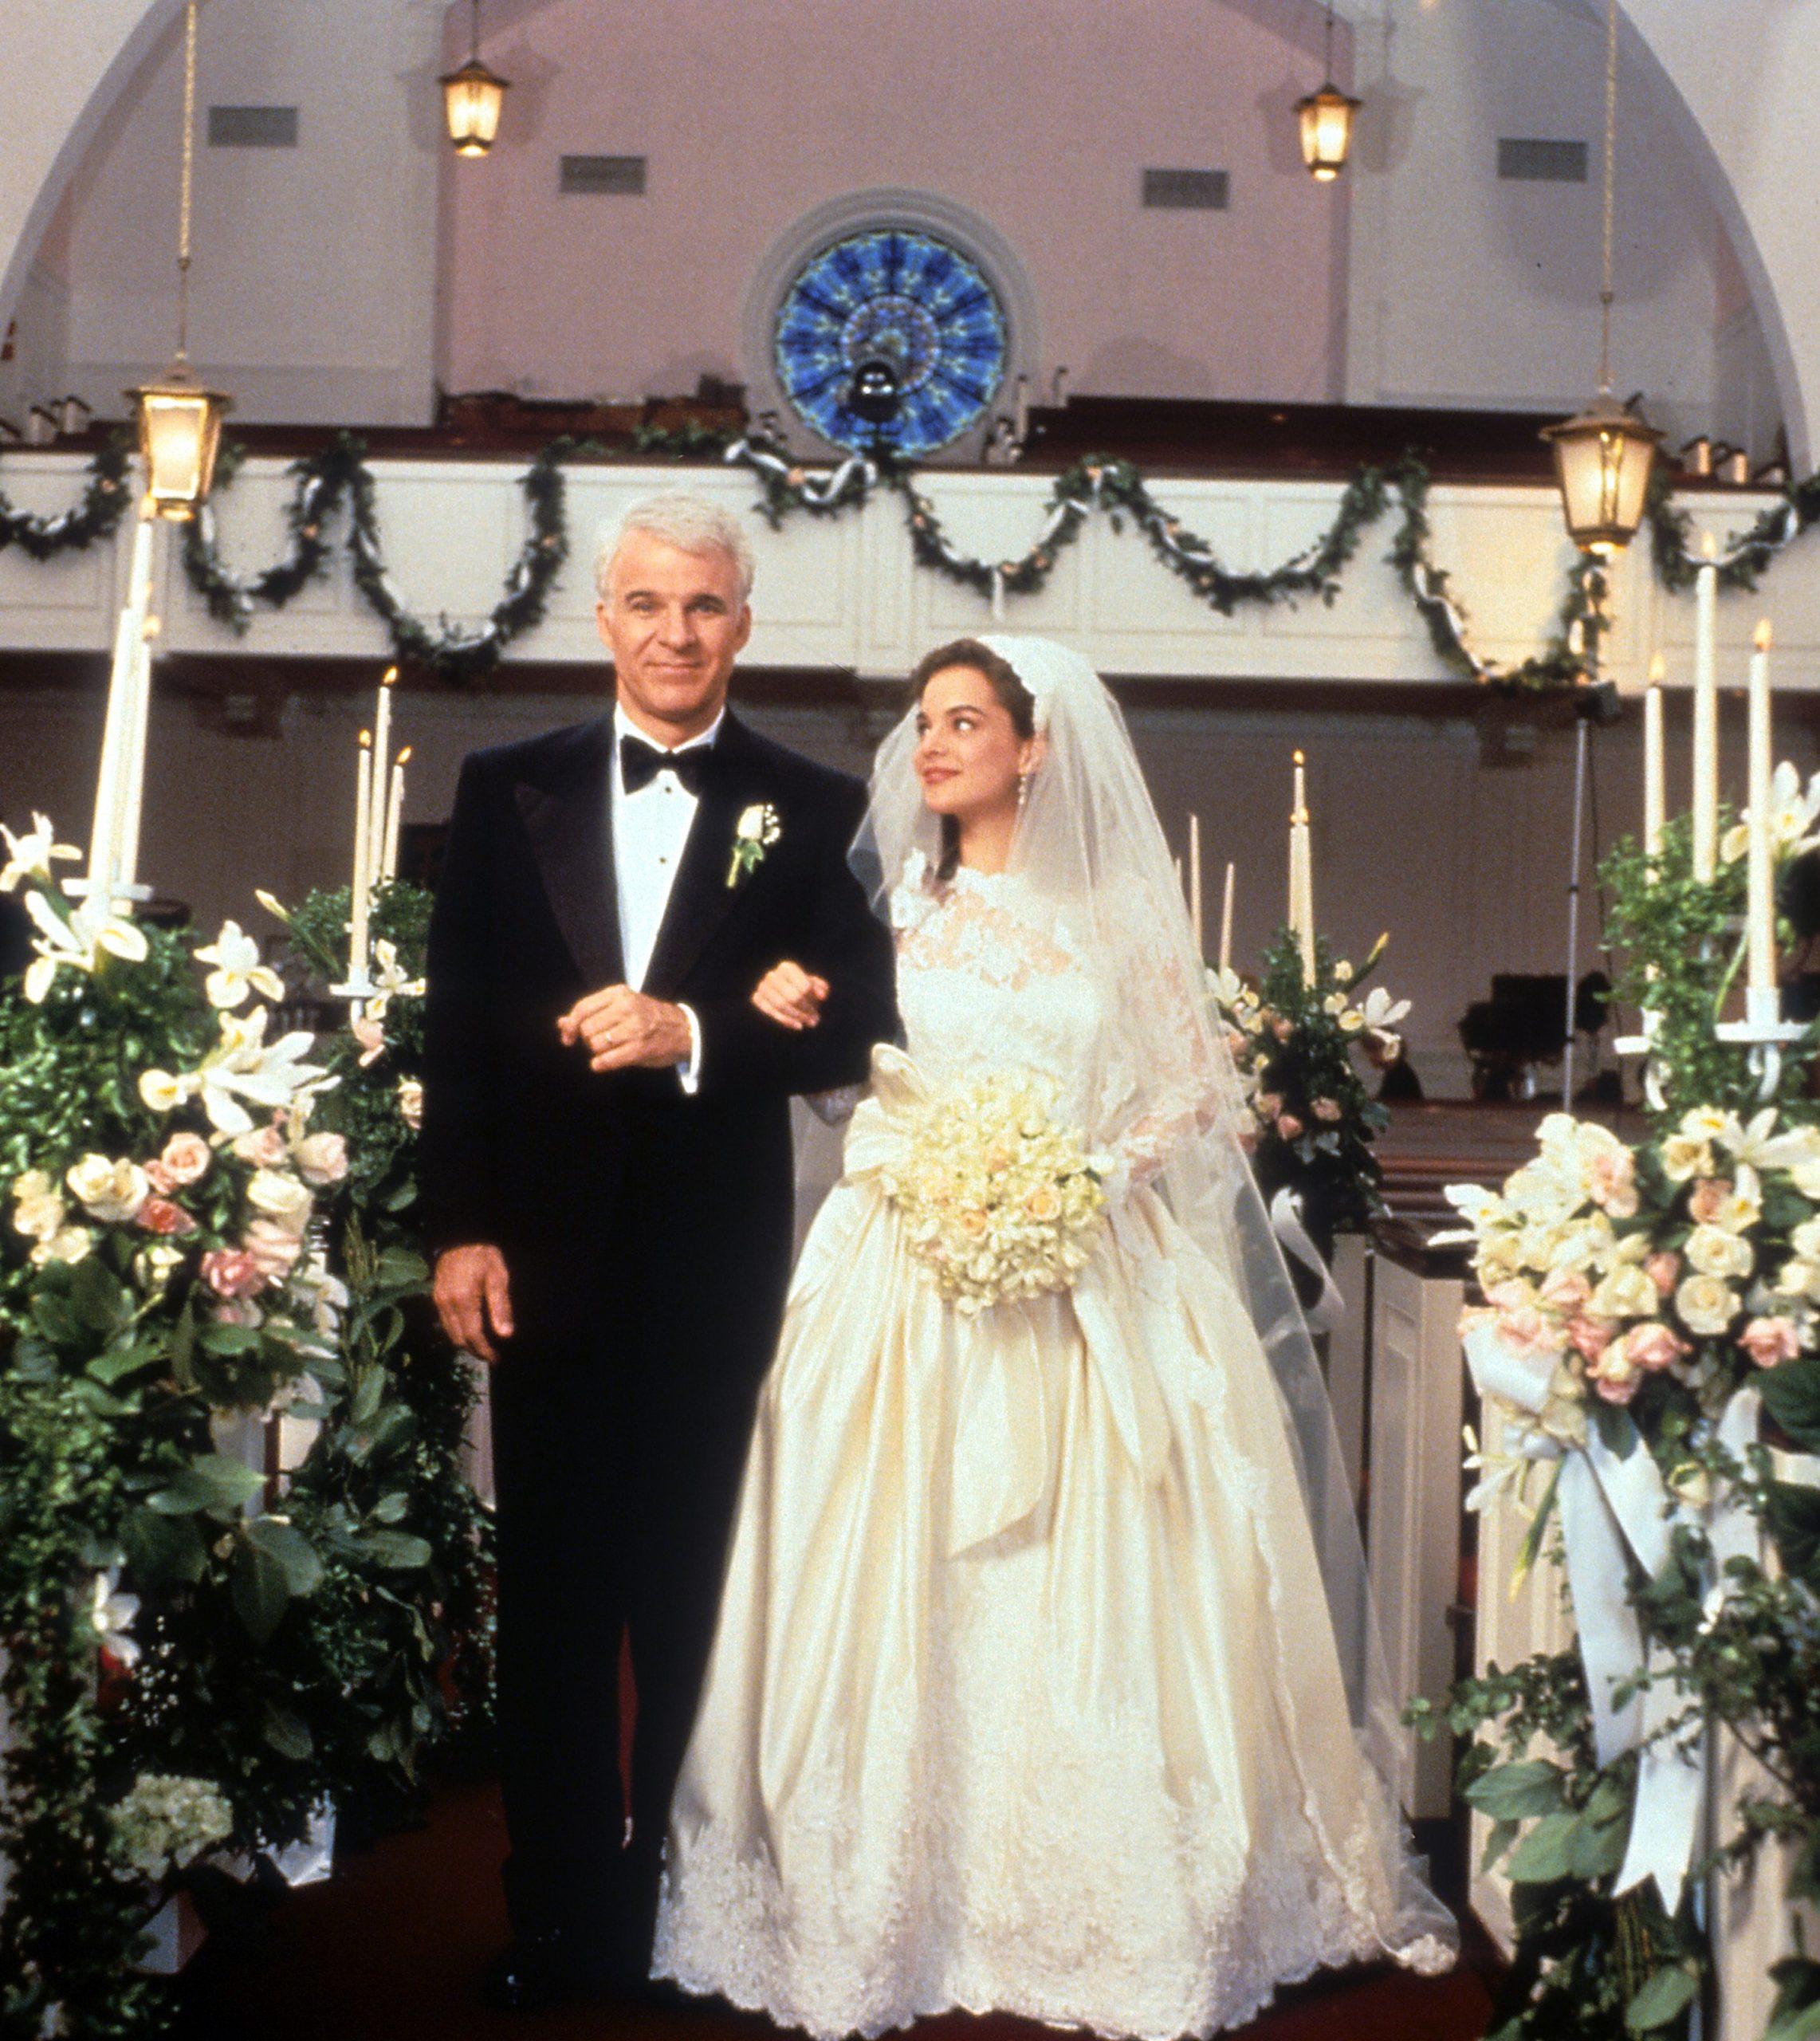 ¡El elenco de 'El padre de la novia' se reunirá para un especial en Netflix!